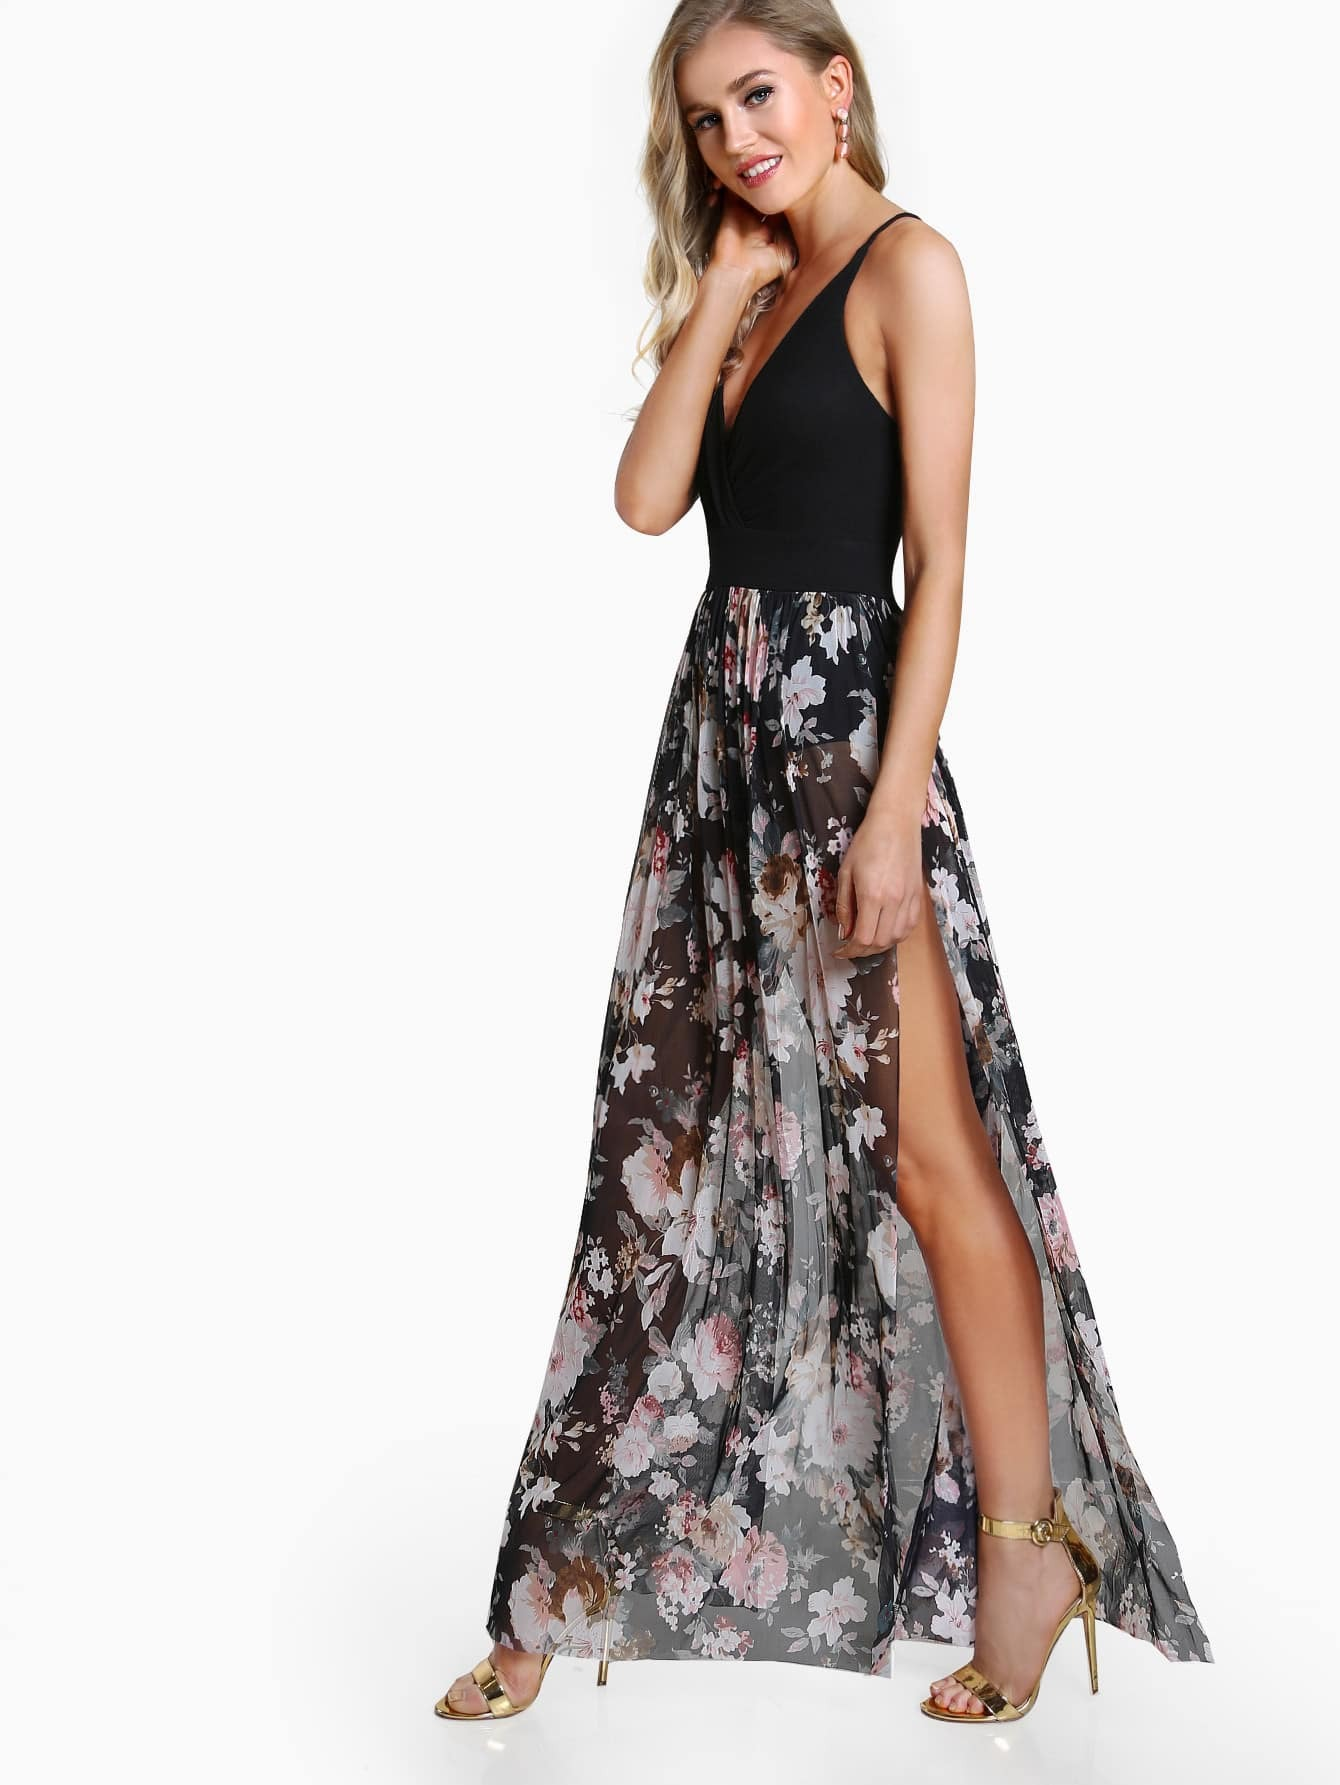 Фото Surplice Strappy Back Bodysuit Mesh Dress. Купить с доставкой